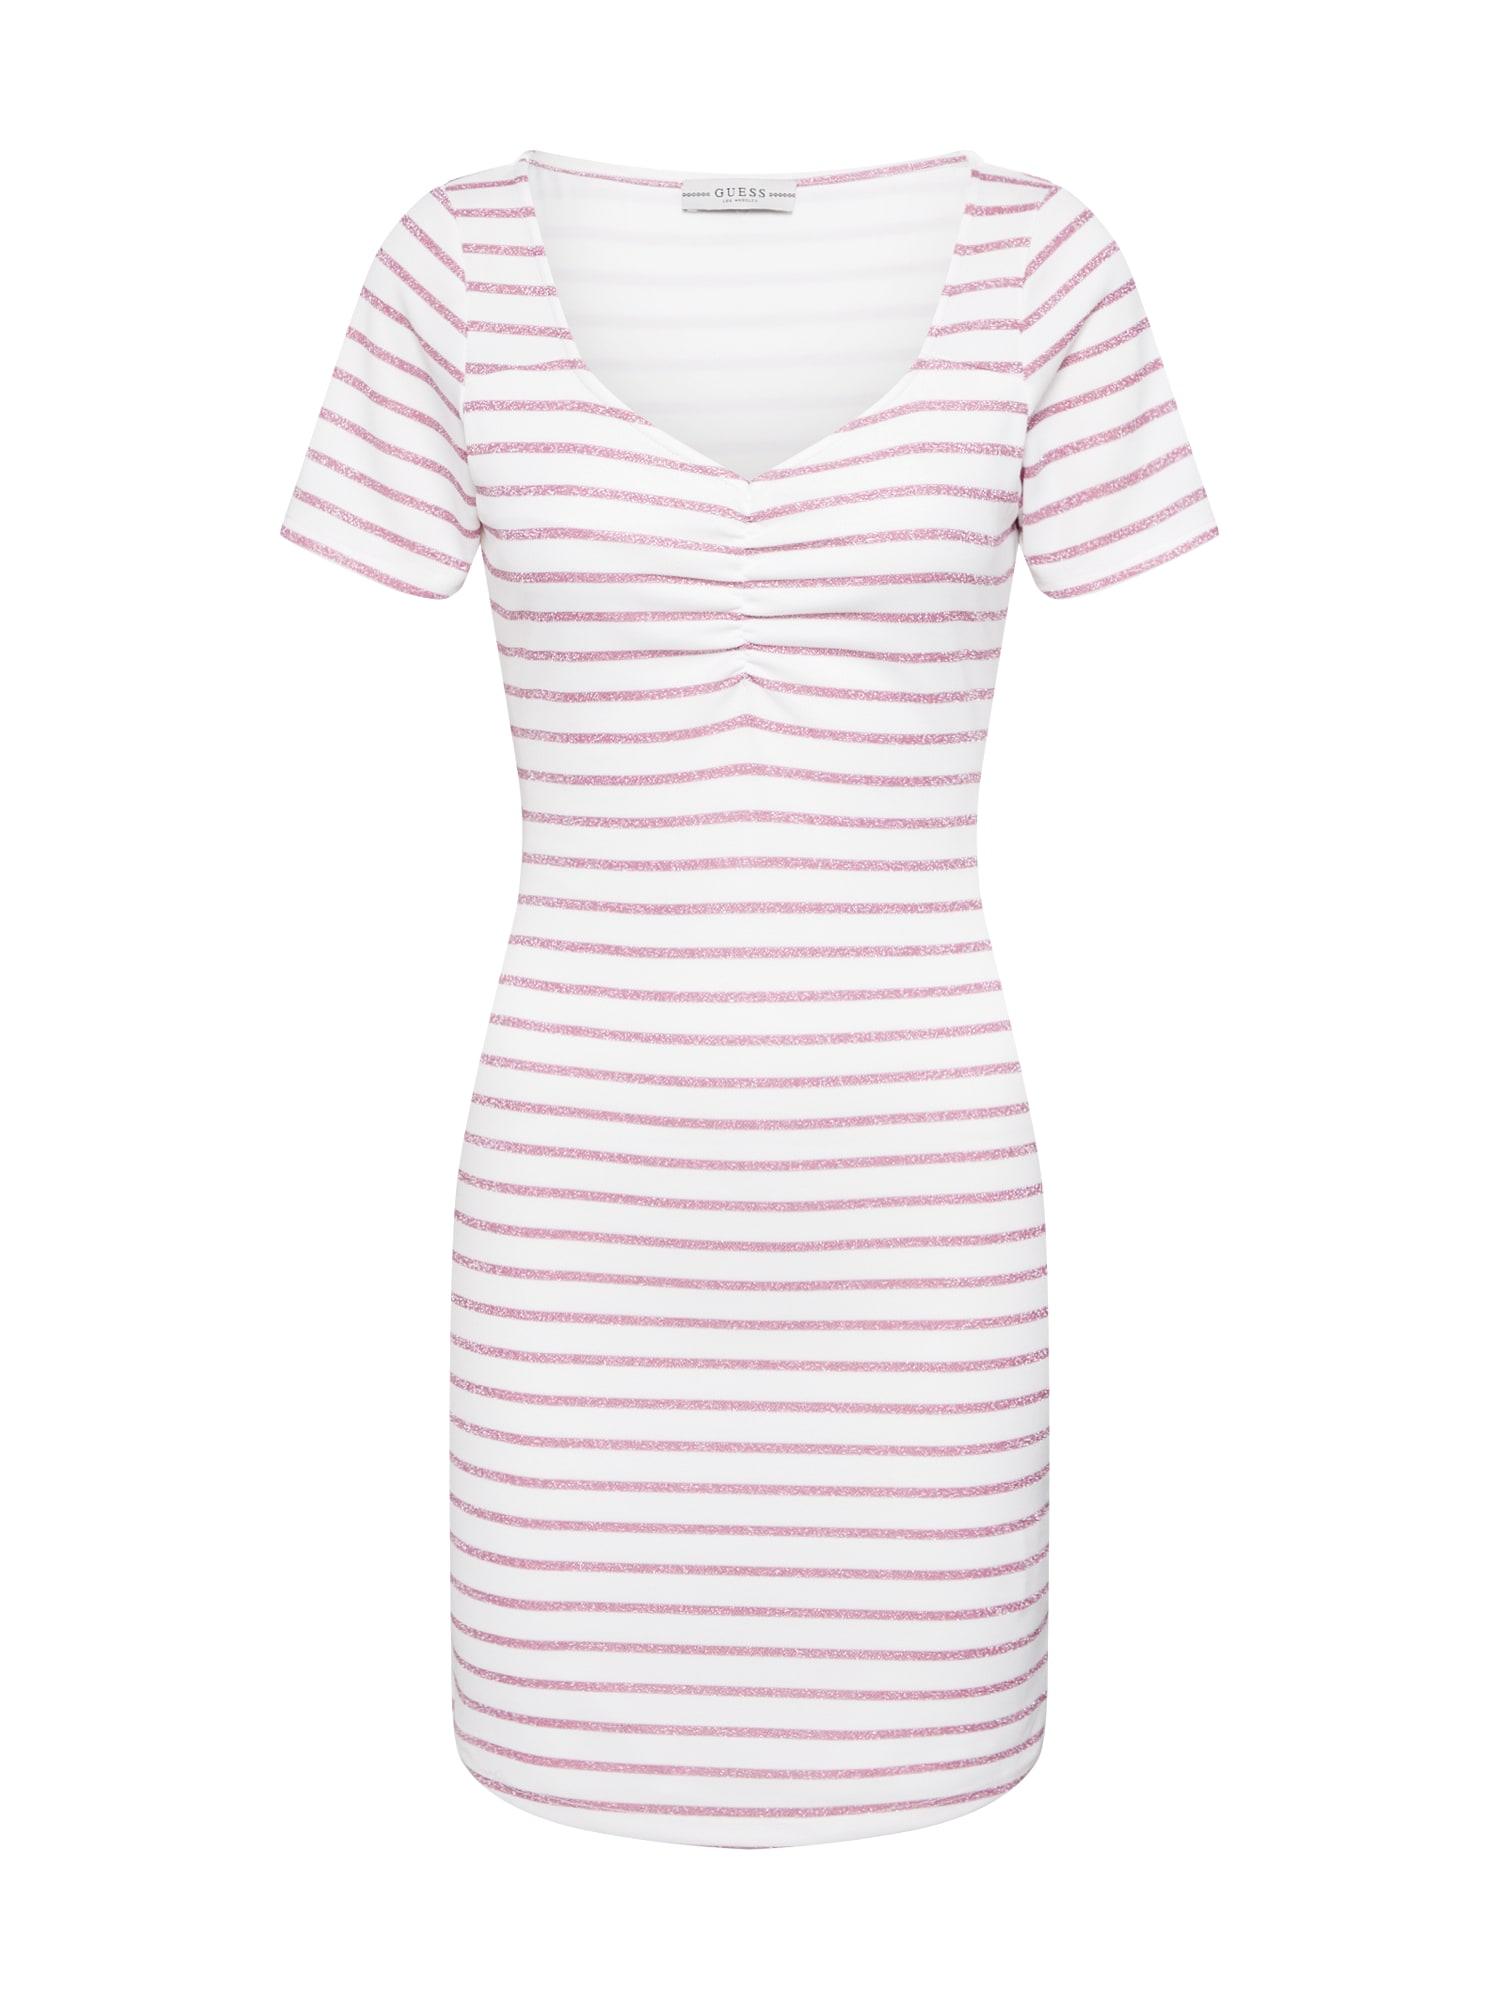 GUESS Suknelė 'ENRIQUETA DRESS' rožinė / balta